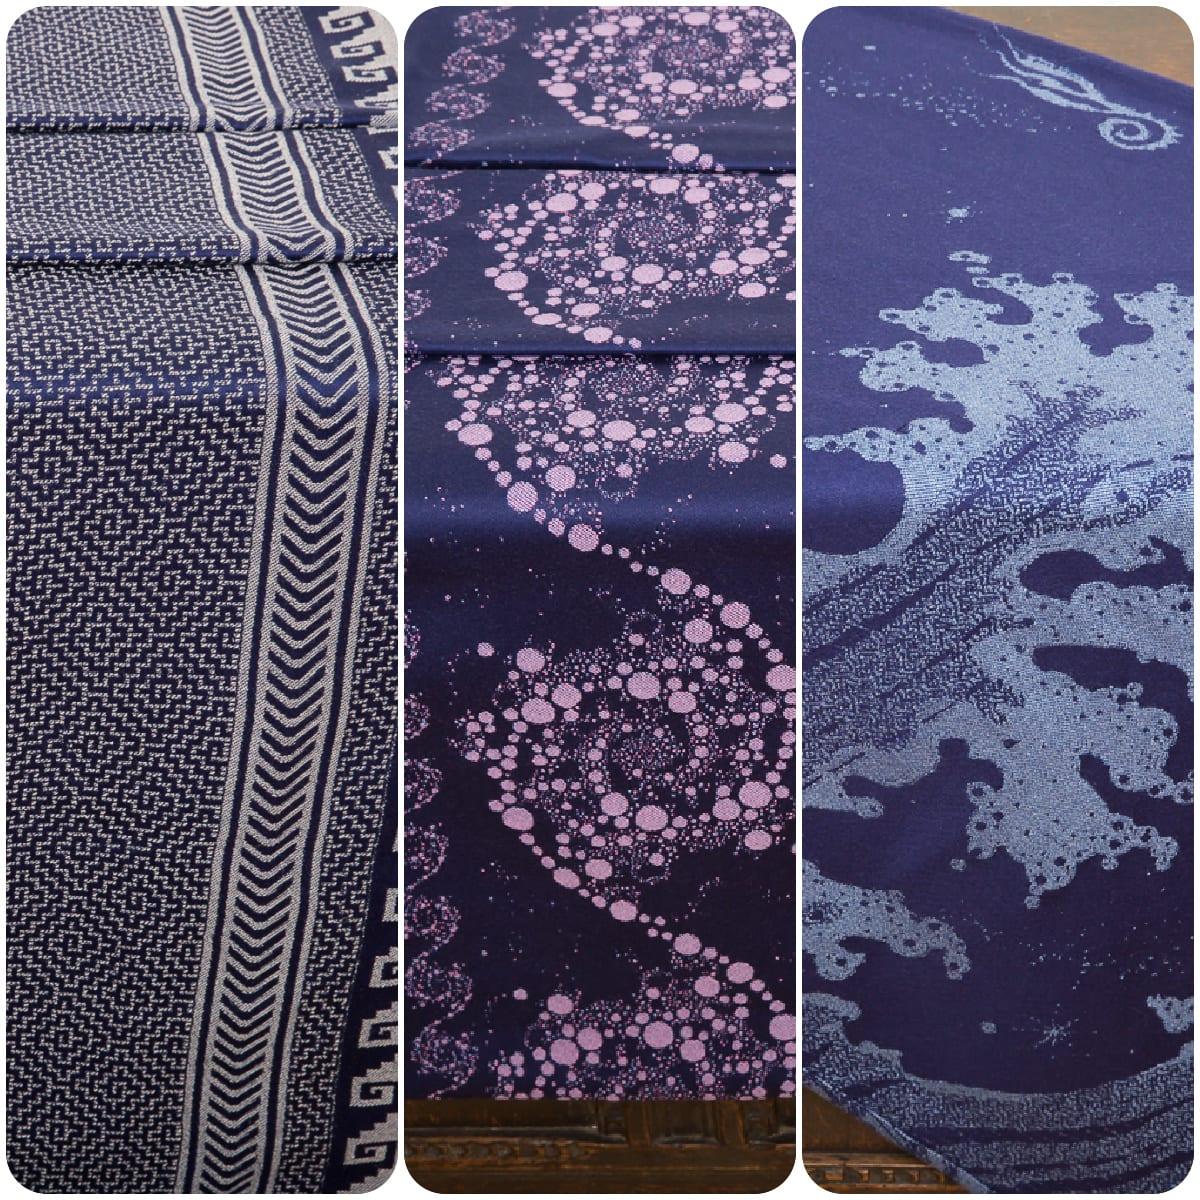 Twilight Weave collage